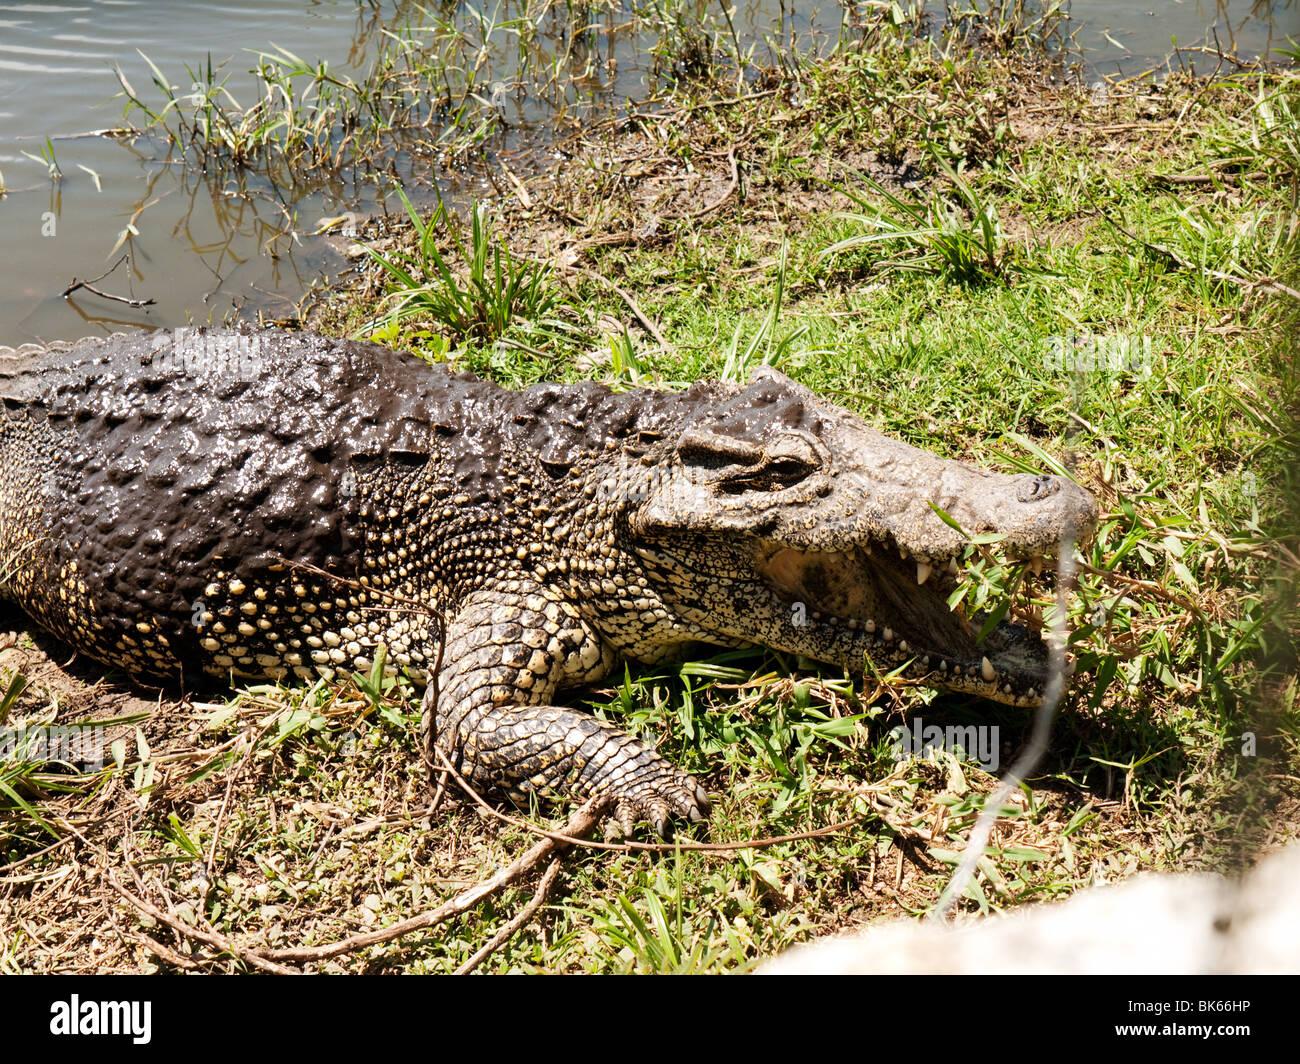 Crocodile in the Crocodile Farm, near Treasure Lake,  Guama, Cuba - Stock Image